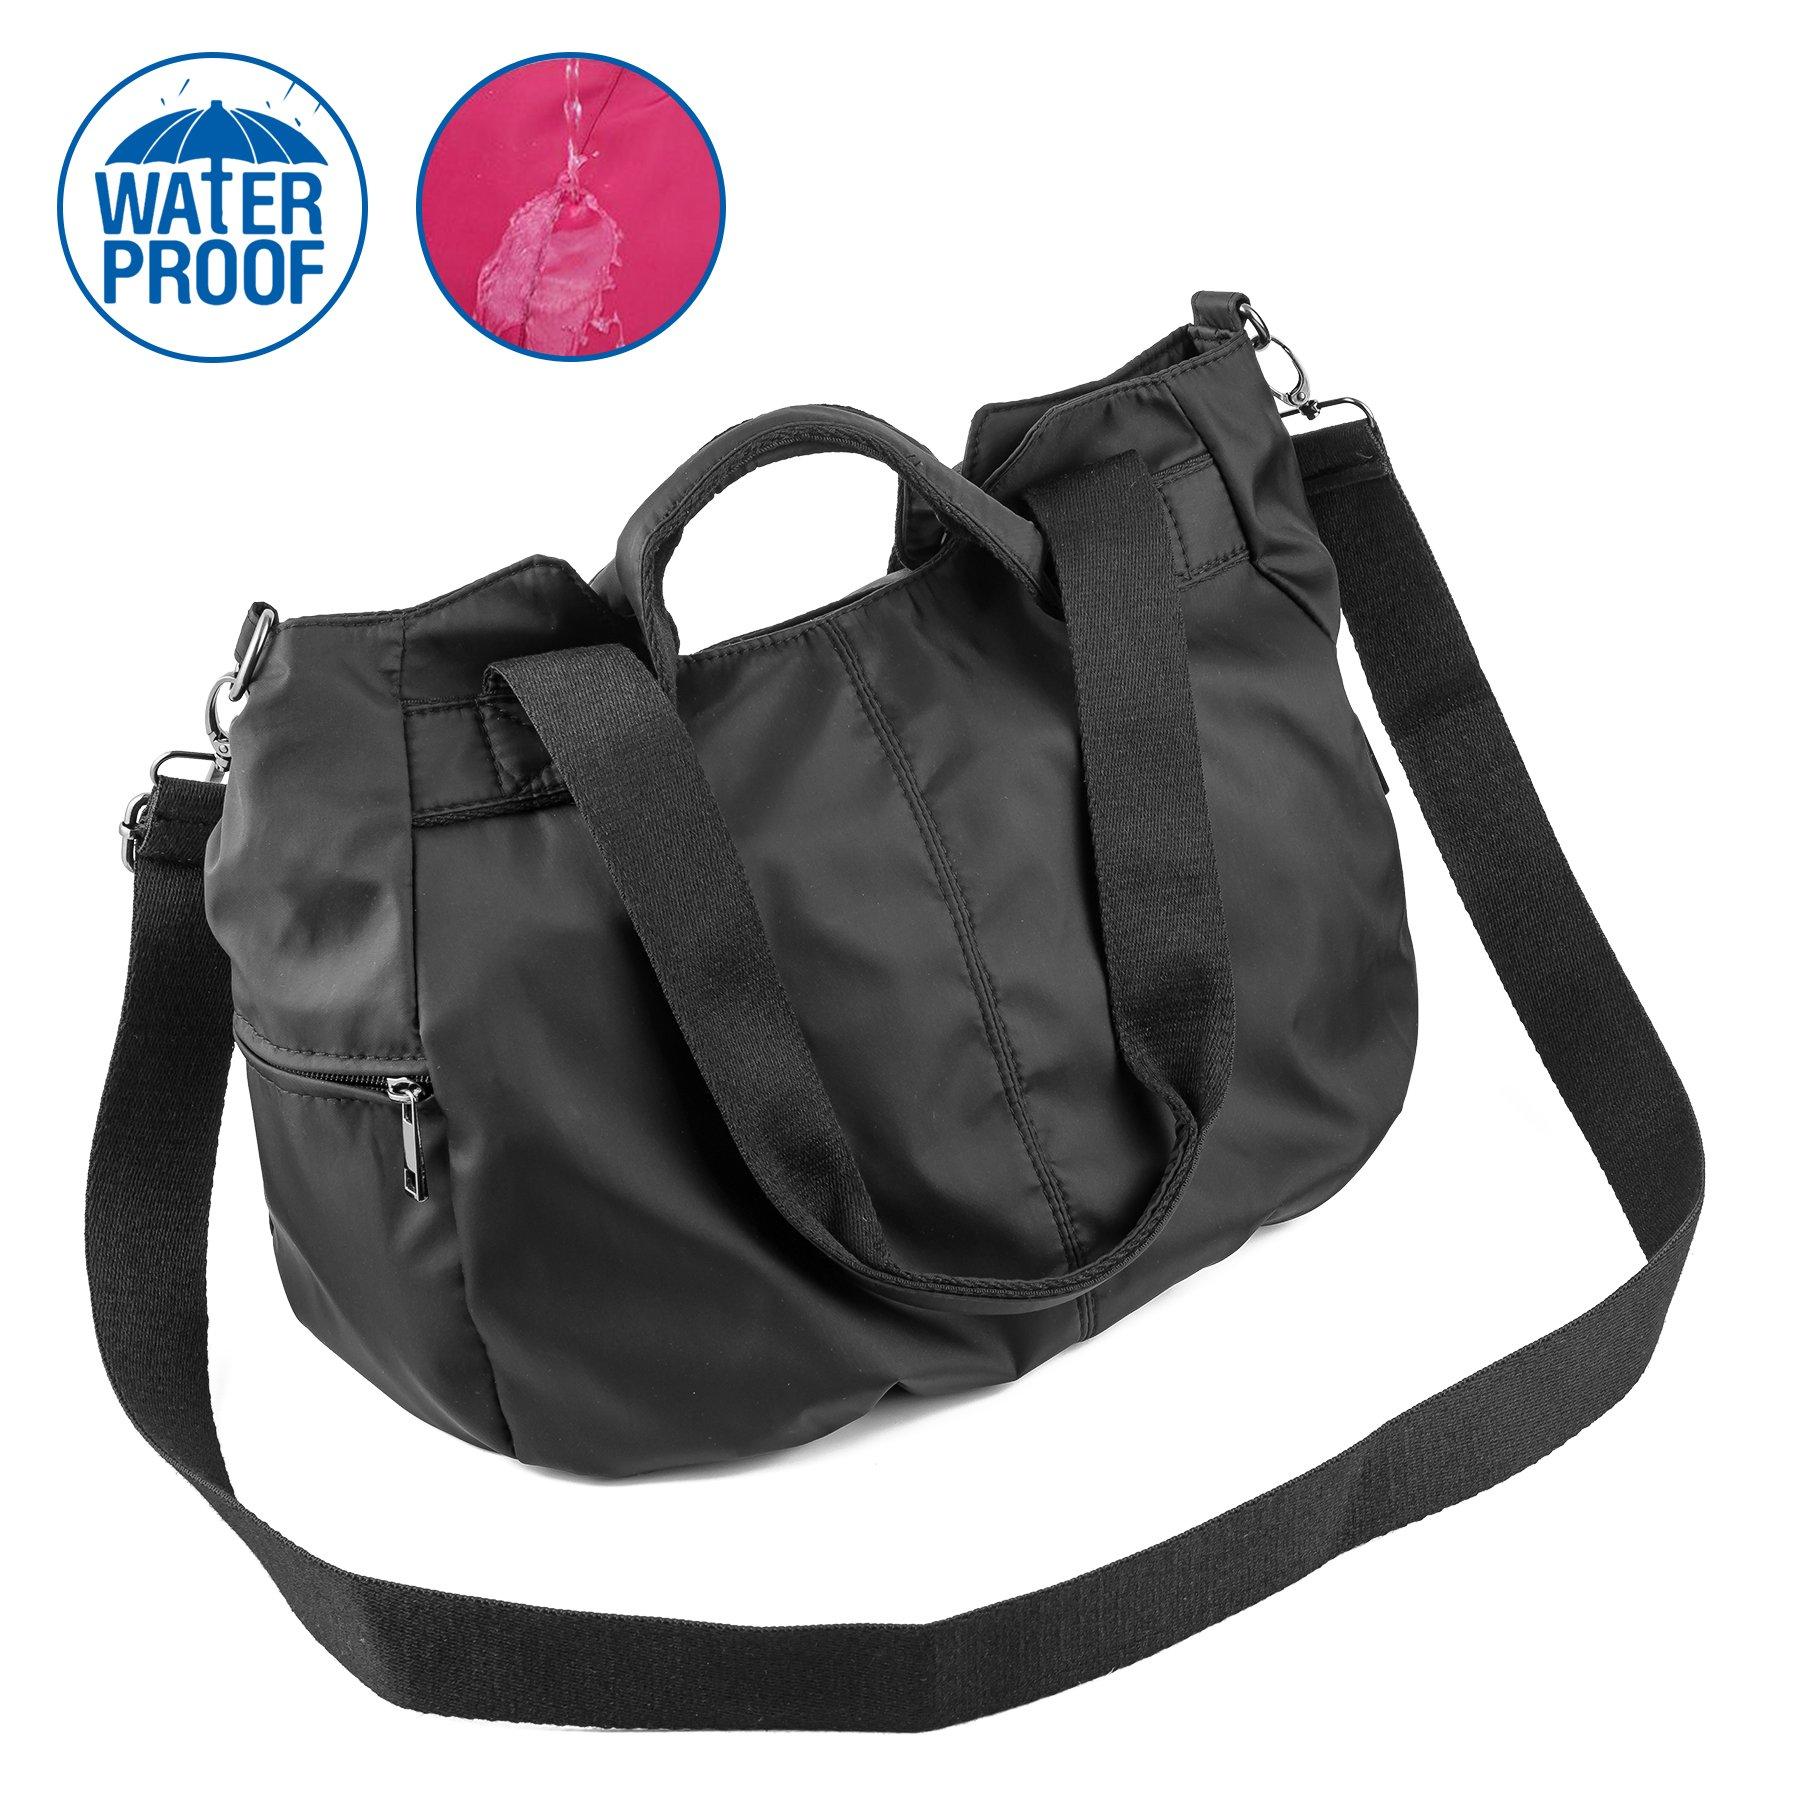 ZORESS Women Fashion Large Tote Shoulder Handbag Waterproof Multi-function Nylon Travel Crossbody Bags (Black)